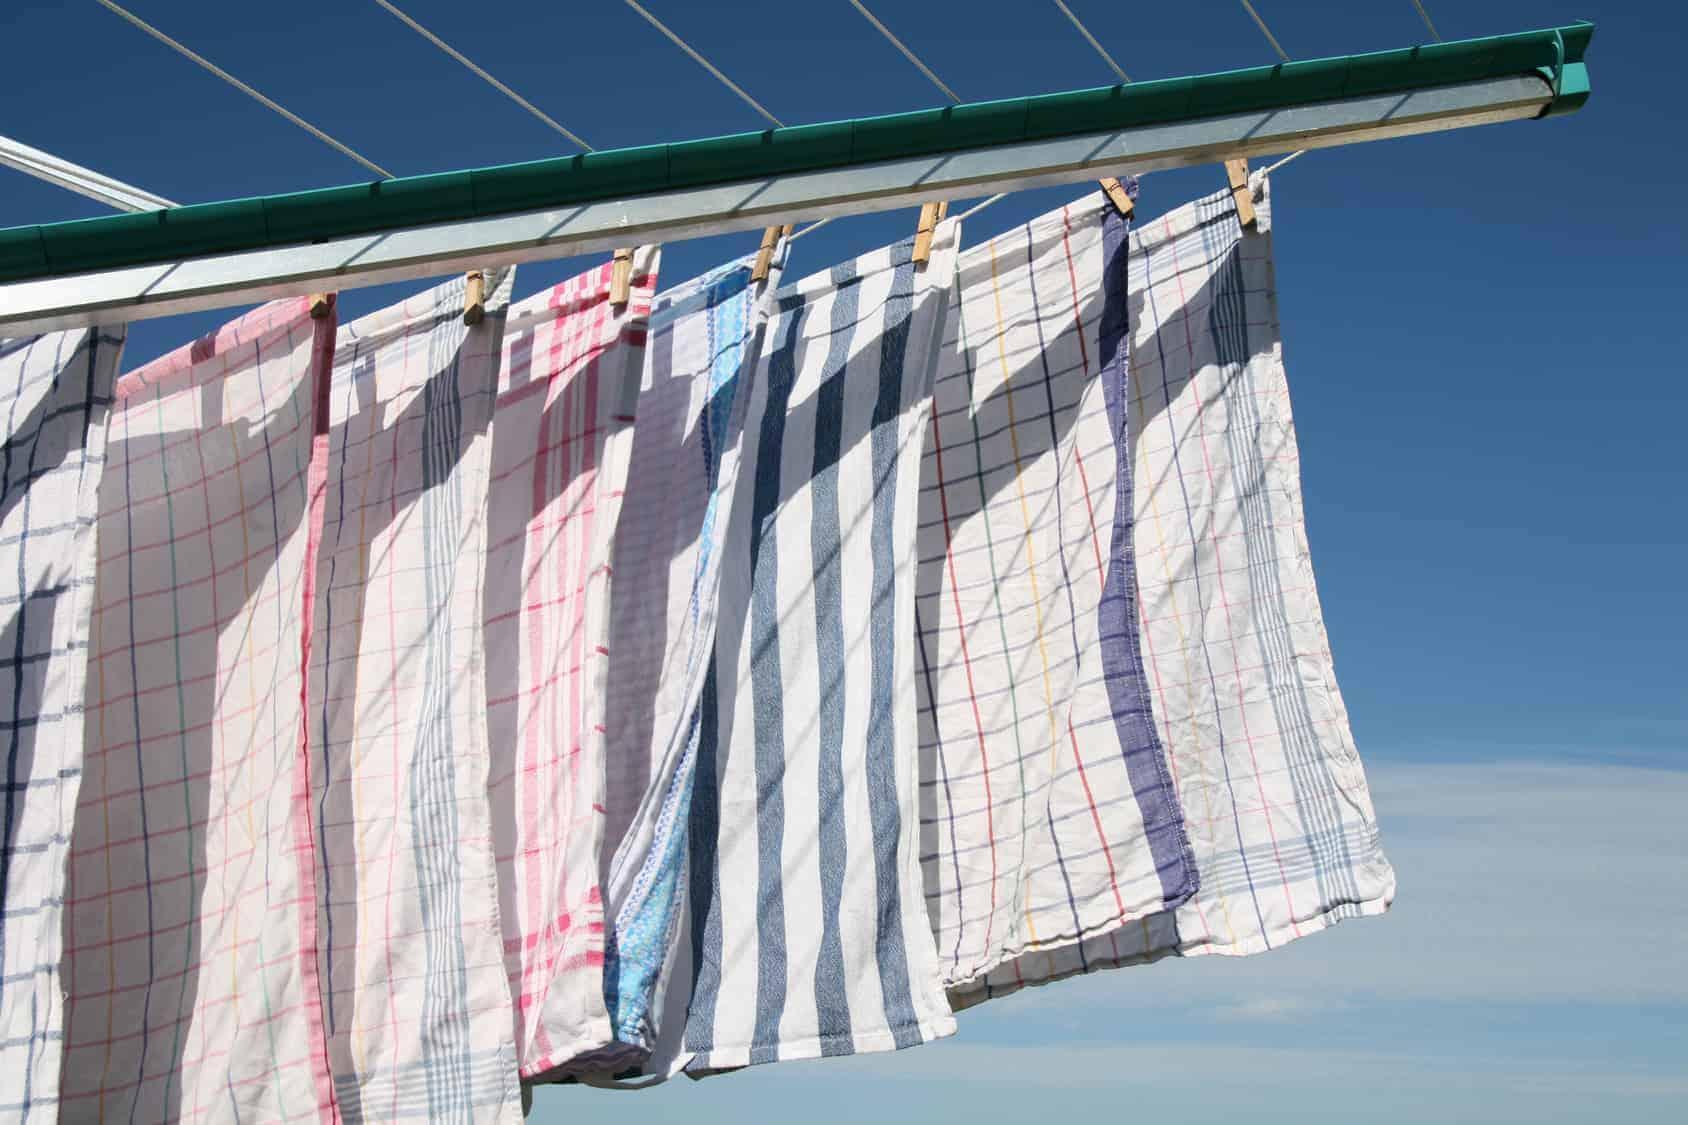 Geschirrtücher hängen an der Wäscheleine (Energiespartipps)